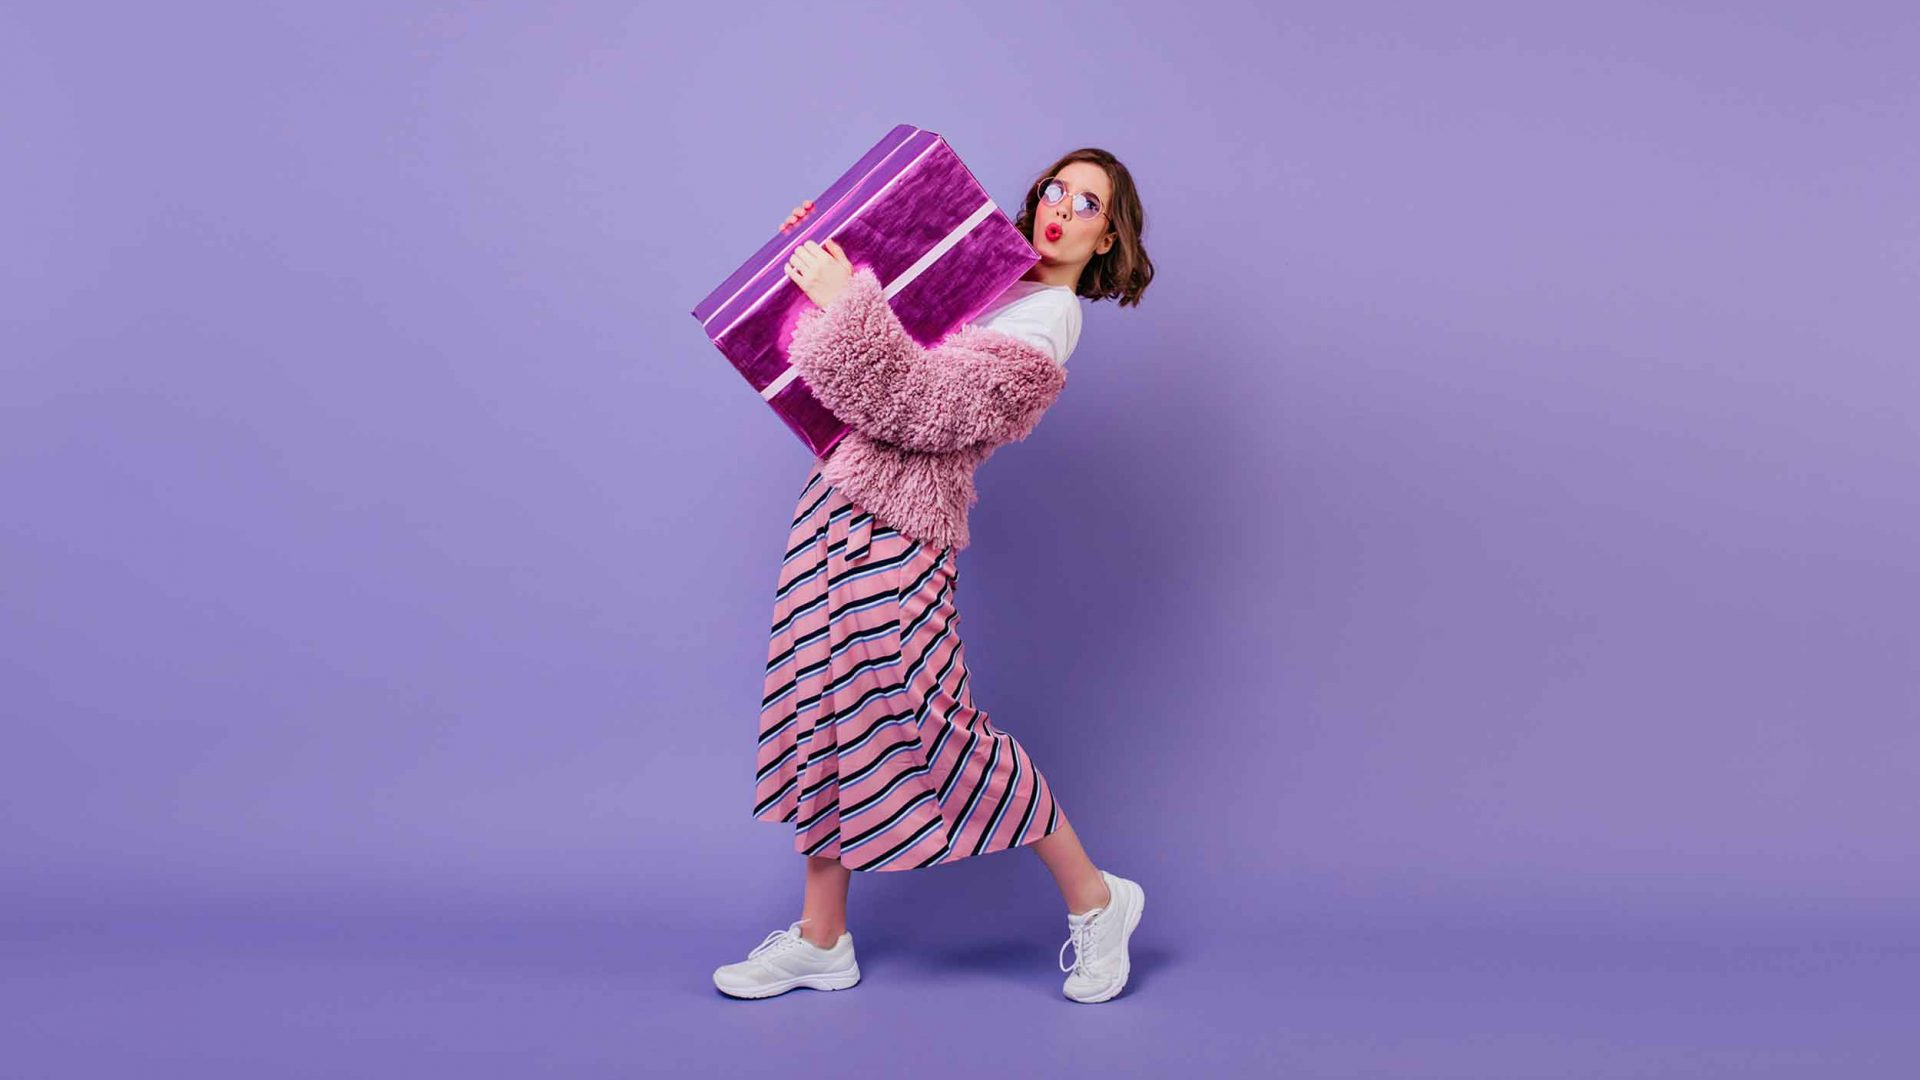 Purple-BG-woman-holding-gift